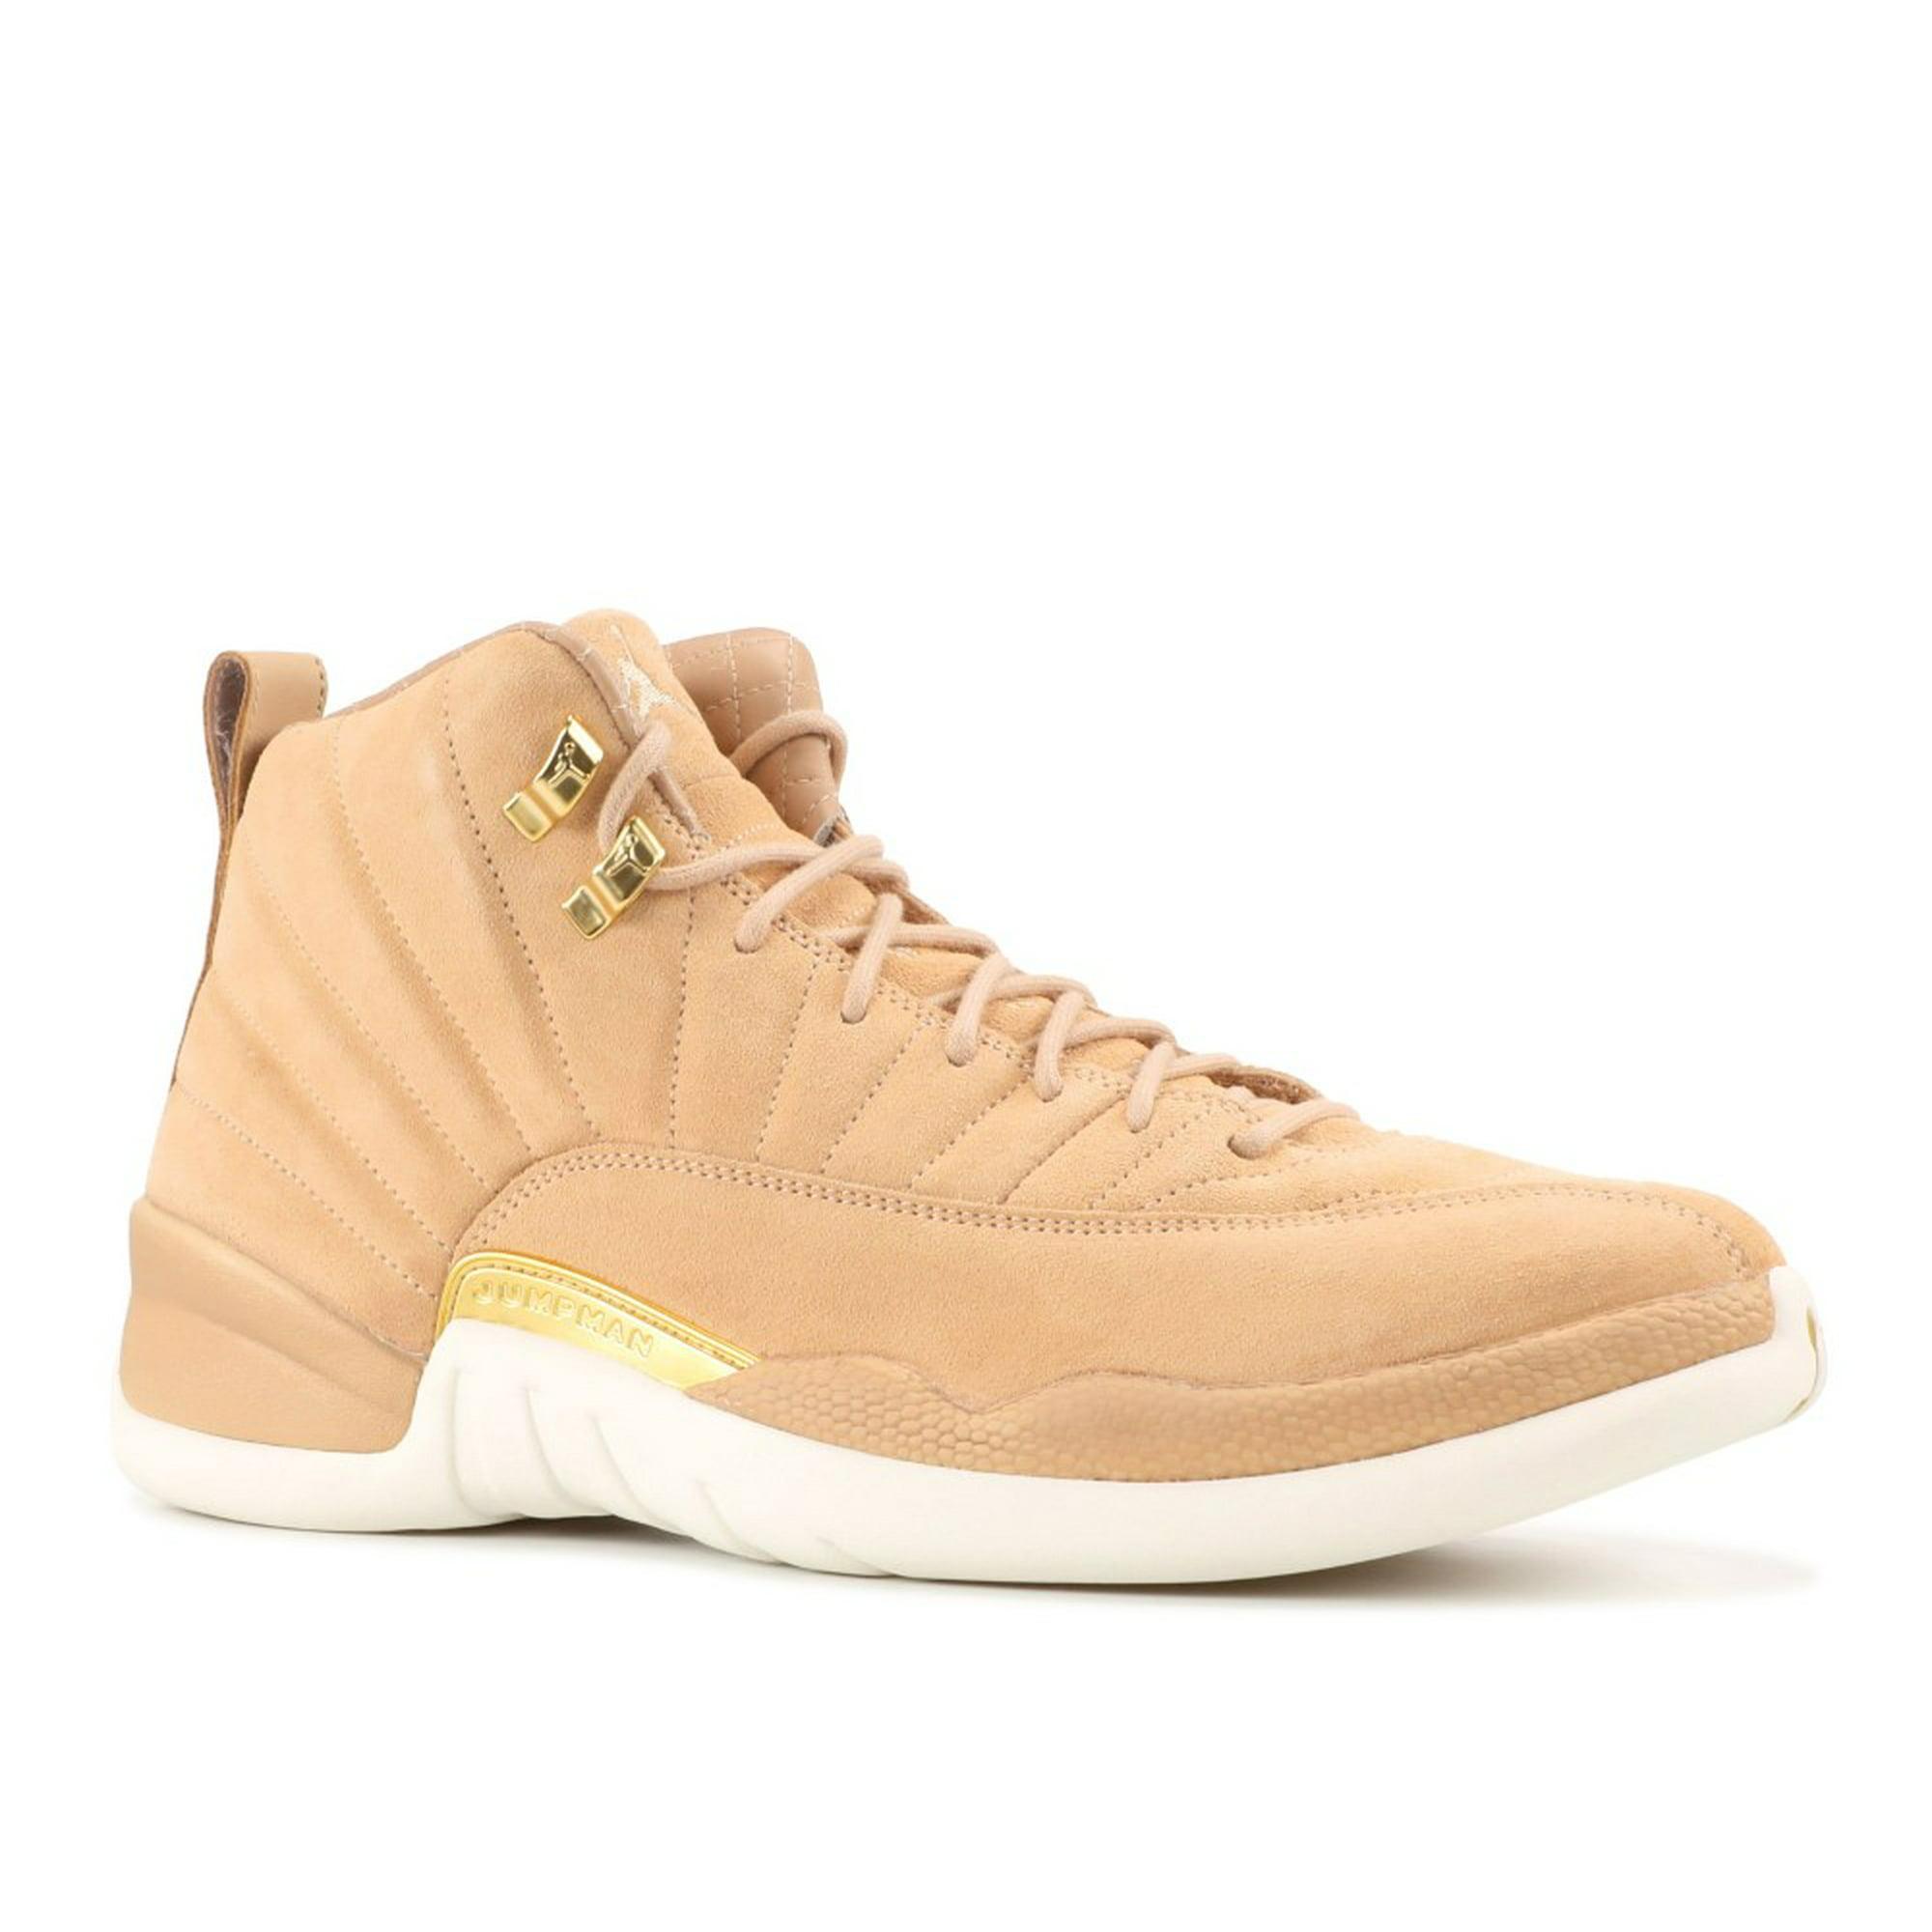 online store 61dfc bee1e Wmns Air Jordan 12 Retro - Ao6068-203 - Size W10.5